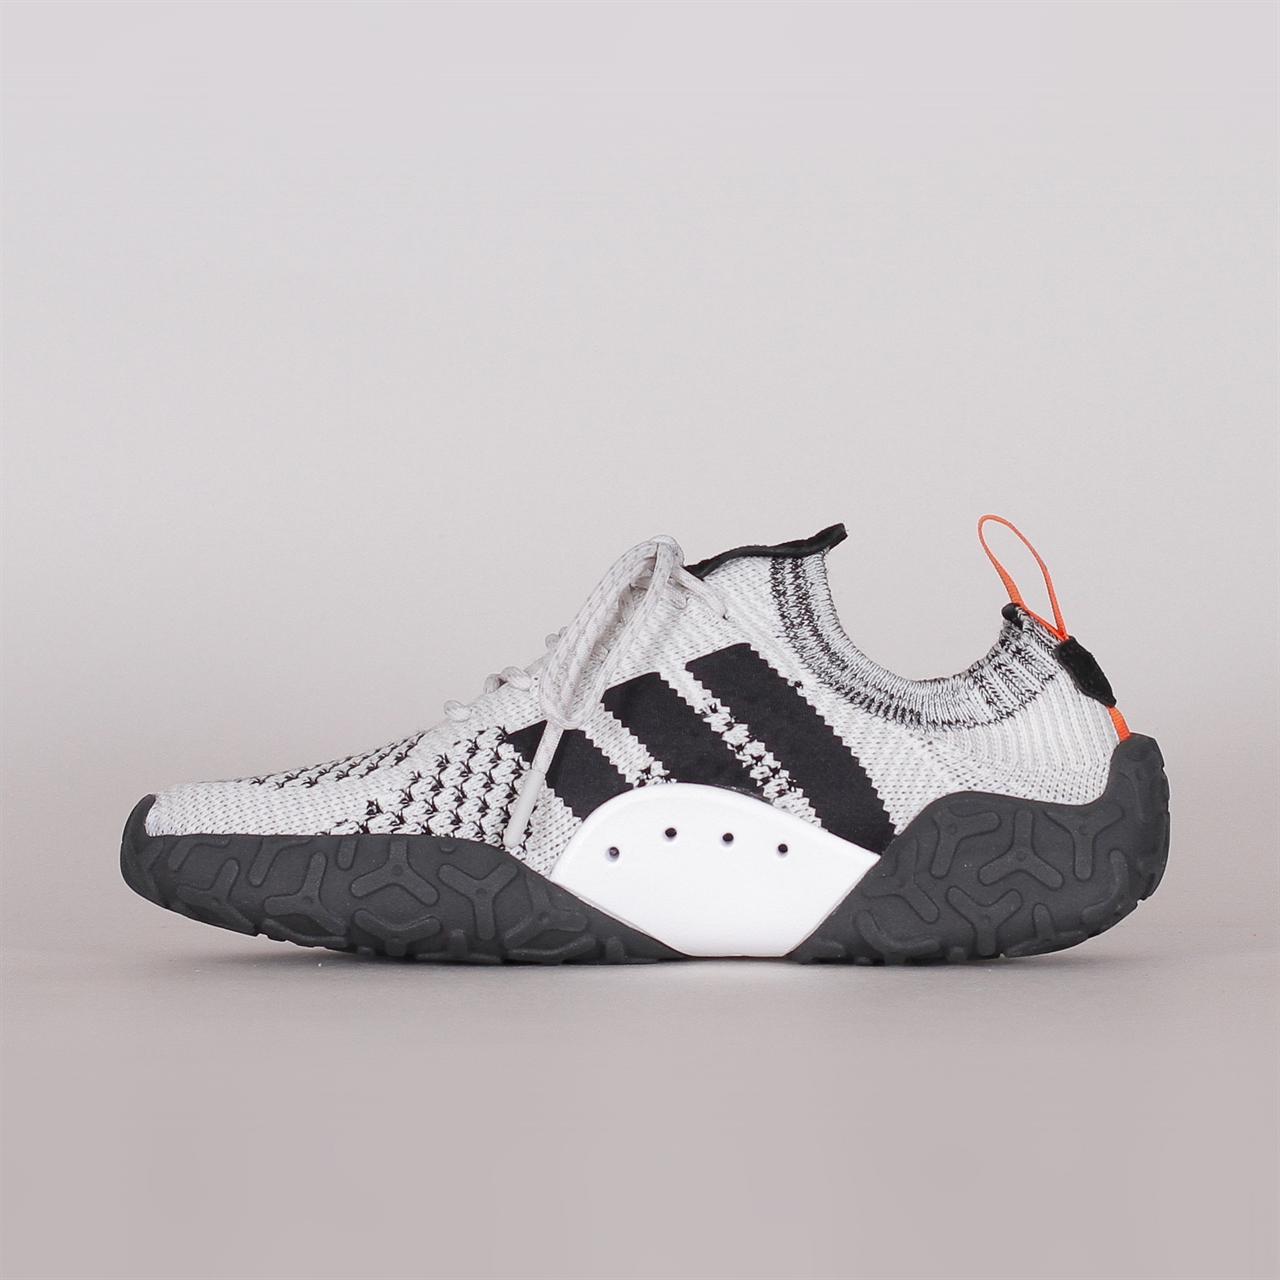 finest selection b07ce f2ca9 Shelta - Adidas Originals F22 PK (CQ3025)